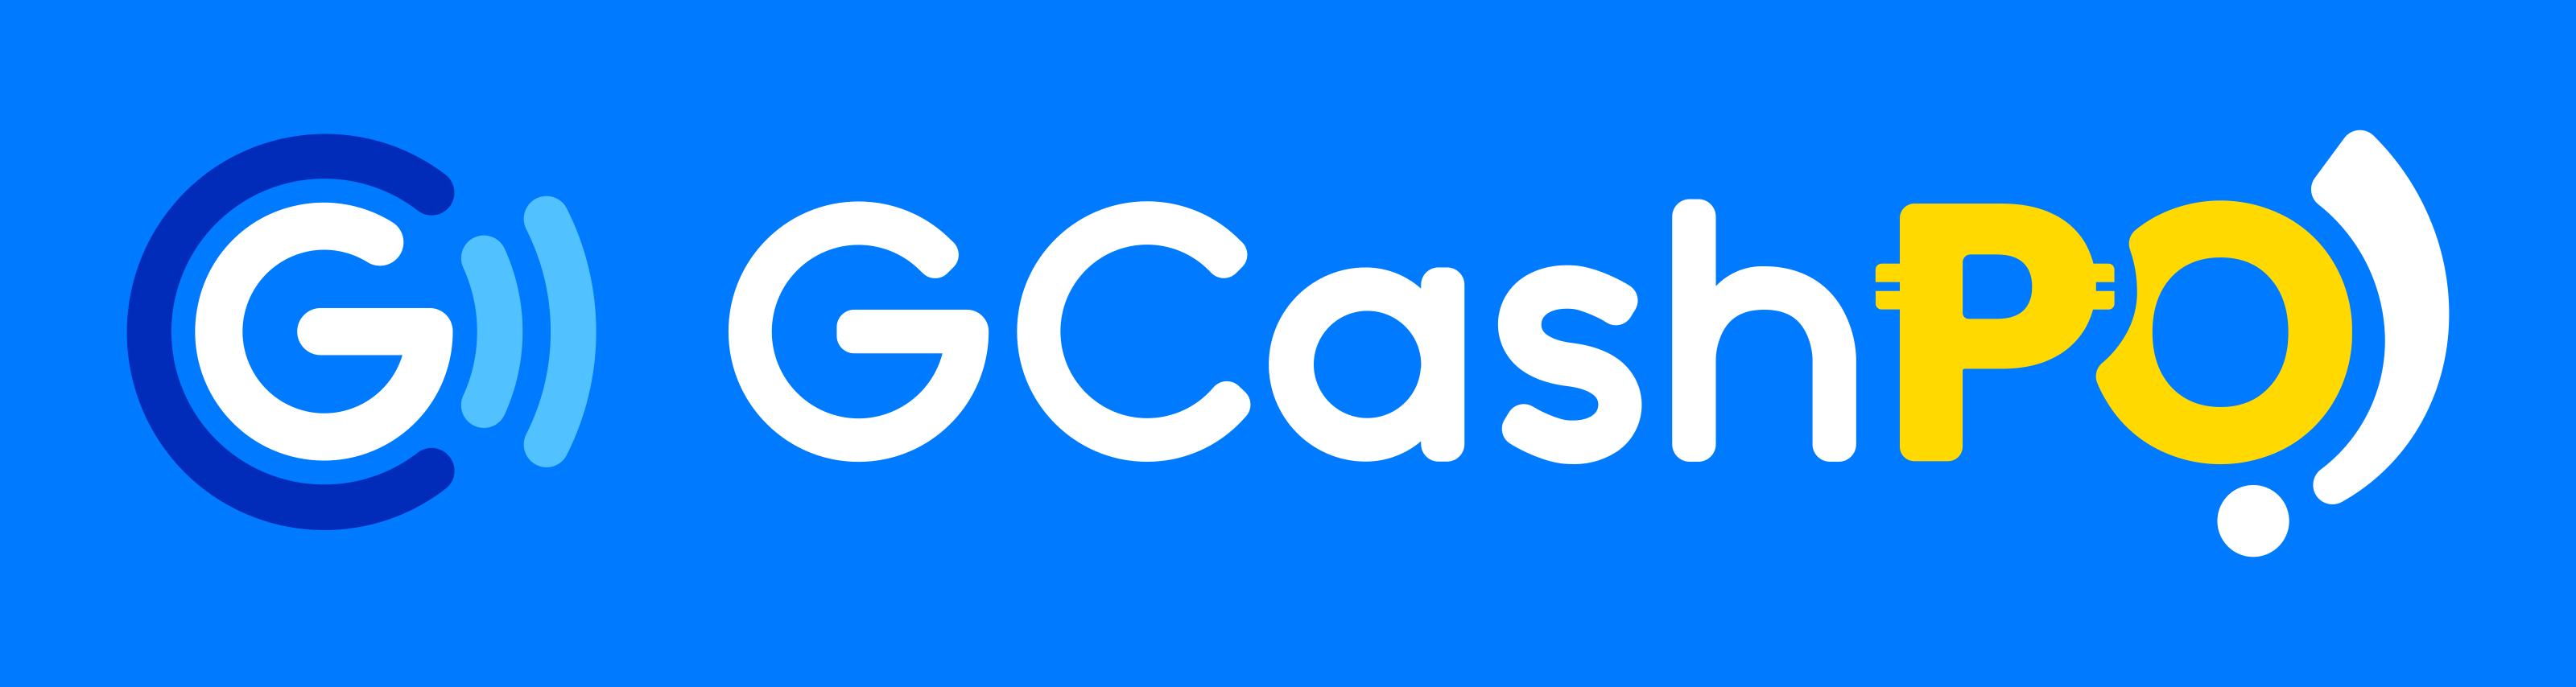 Services - Financial-Services - Padala - Partners - GCash Padala Outlet - 3200x854 - Logo